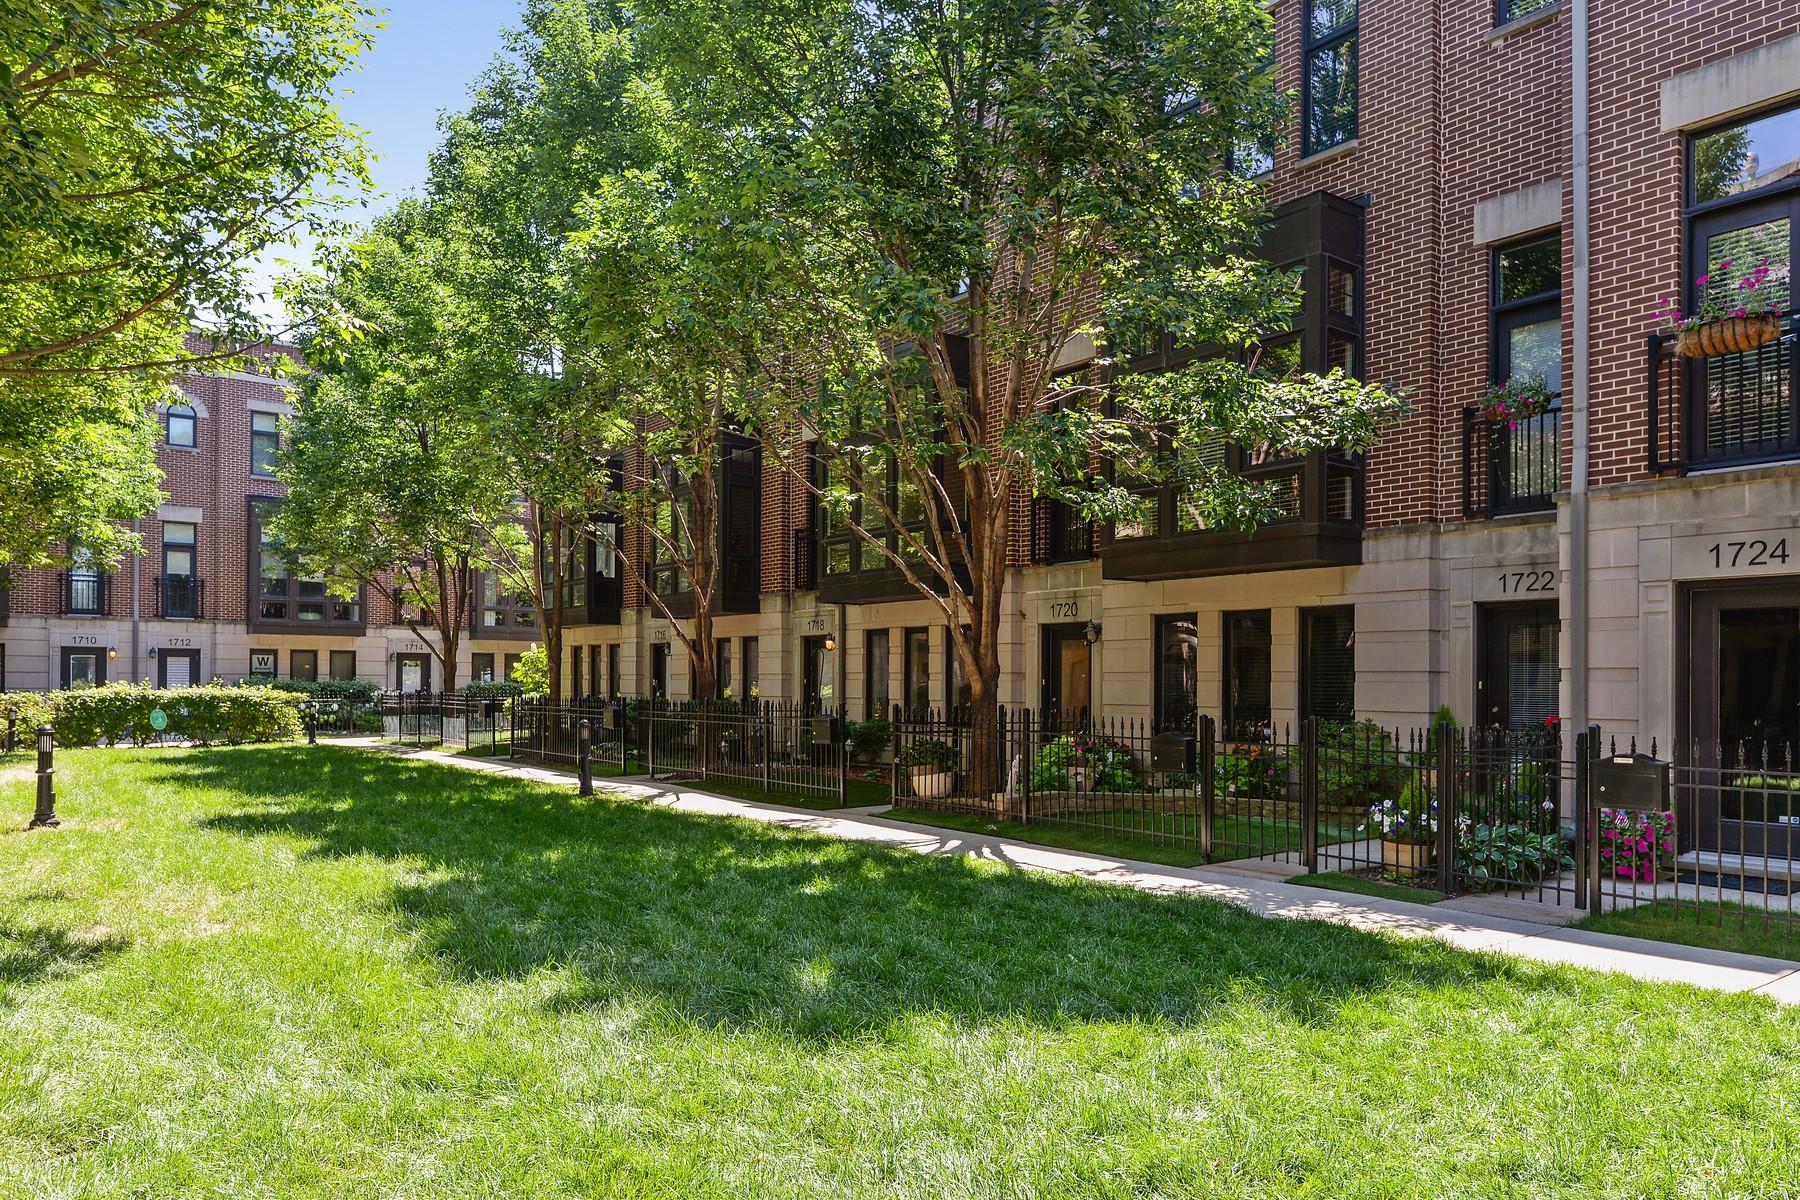 Casa para uma família para Venda às Wonderful Townhome at Columbia Place 1720 W Surf Street Unit 36 Chicago, Illinois, 60657 Estados Unidos